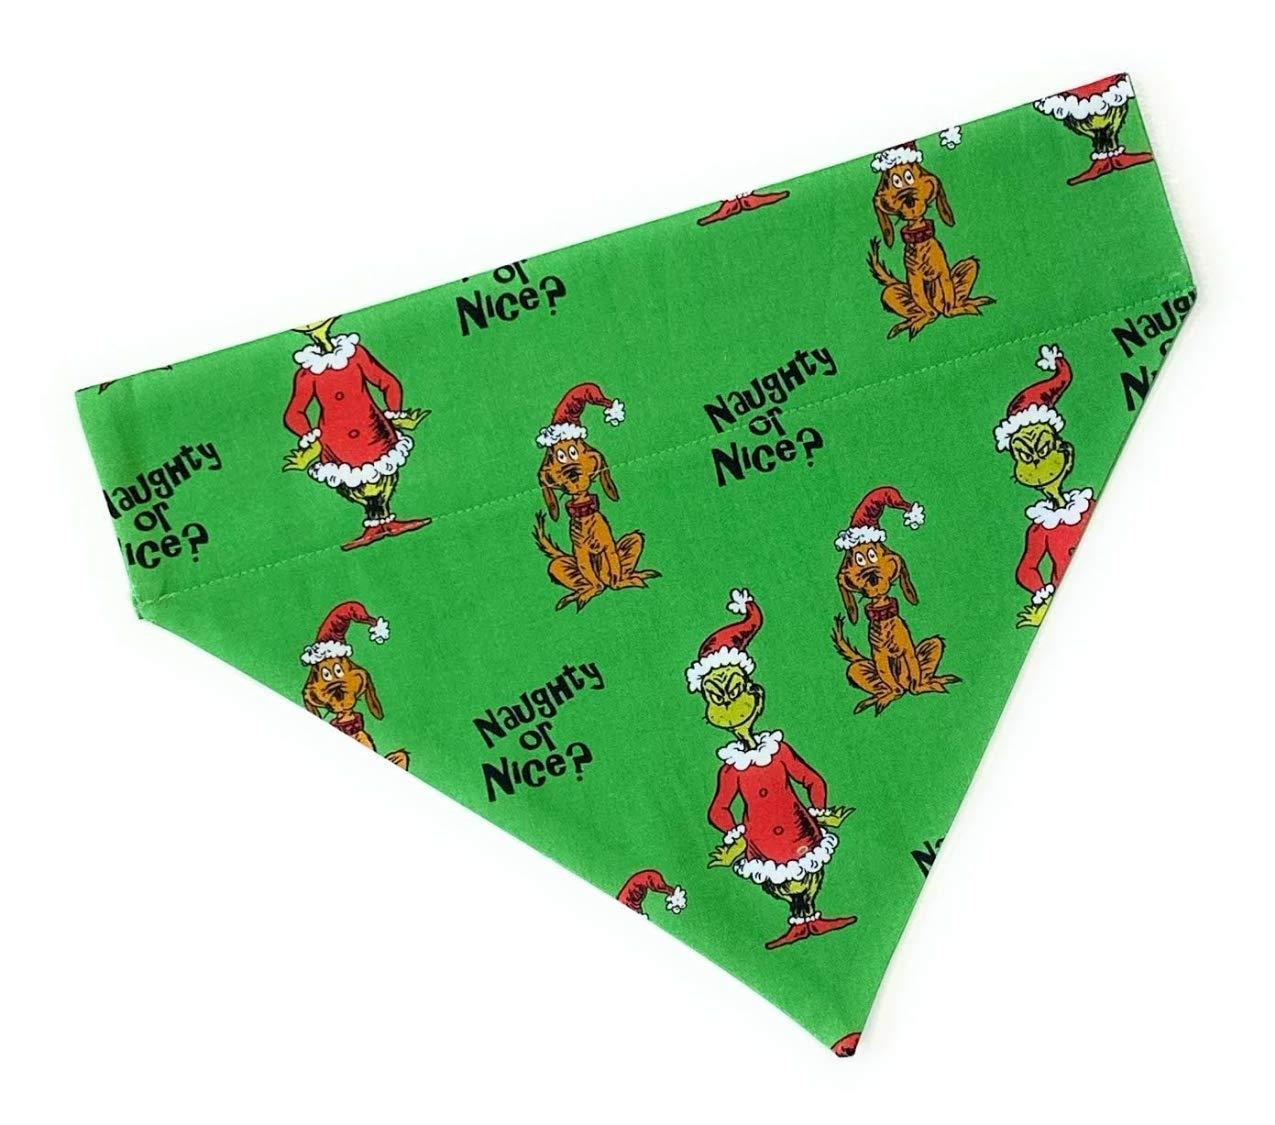 Dog Scarf Bandana-Grinch and Max-Christmas-Handmade-no tie slides over collar-Size Large